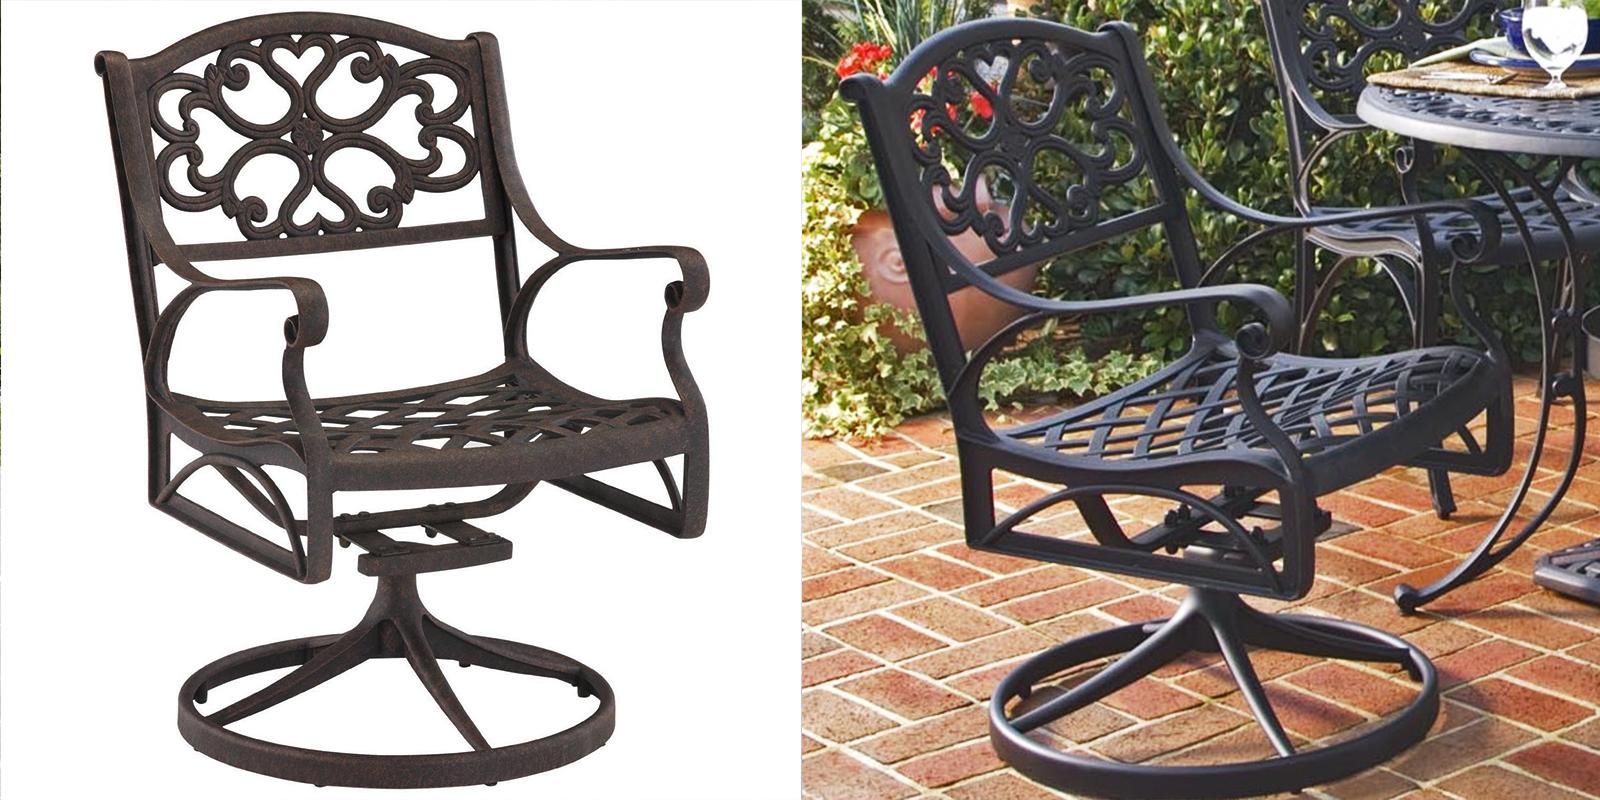 Patio Chair - Swivel-Rocking Arm Chair